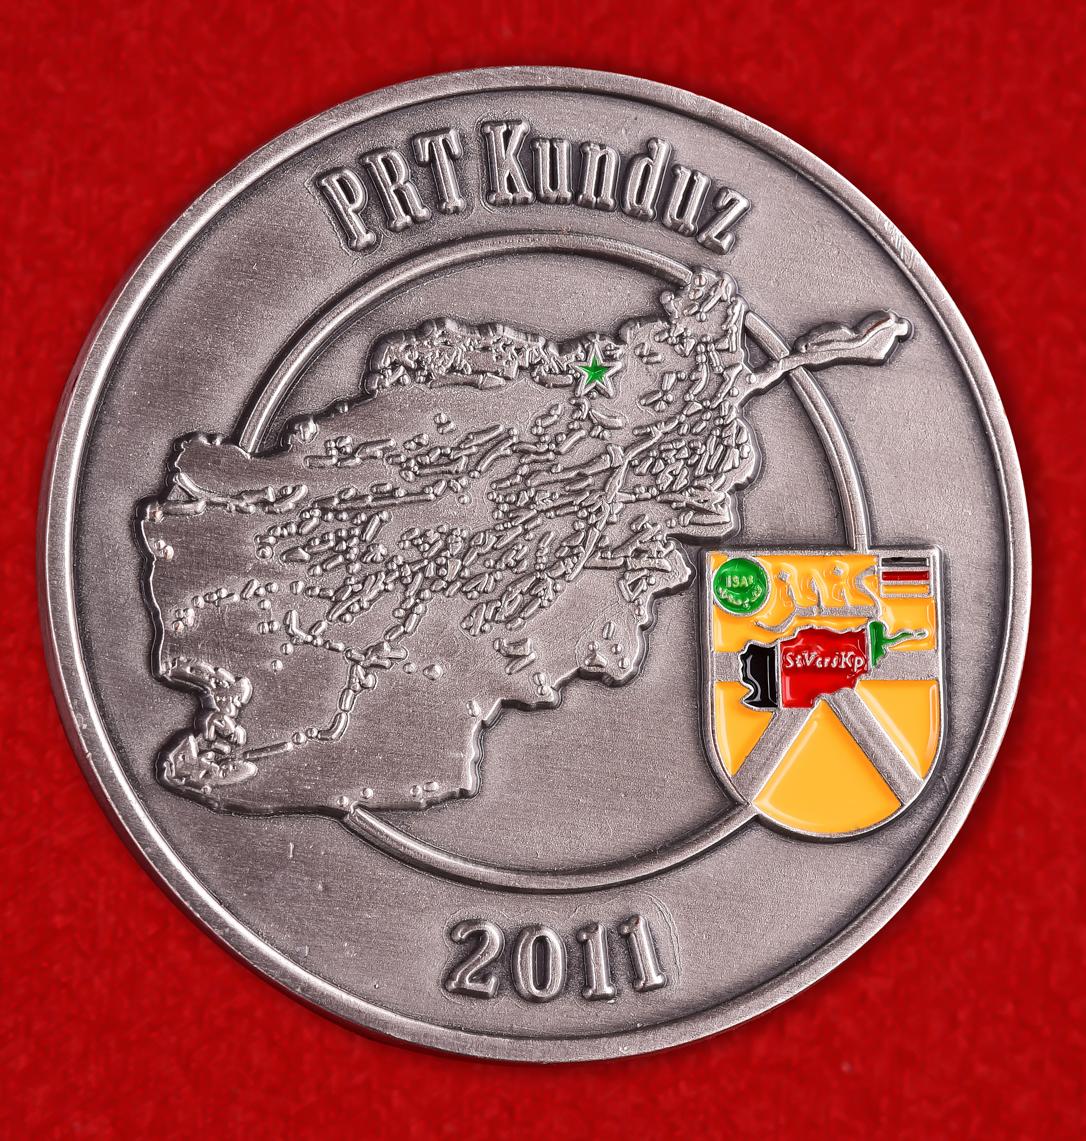 "Немецкий военный знак НАТО ""За службу на базе Кундуз, Афганистан-2011"""